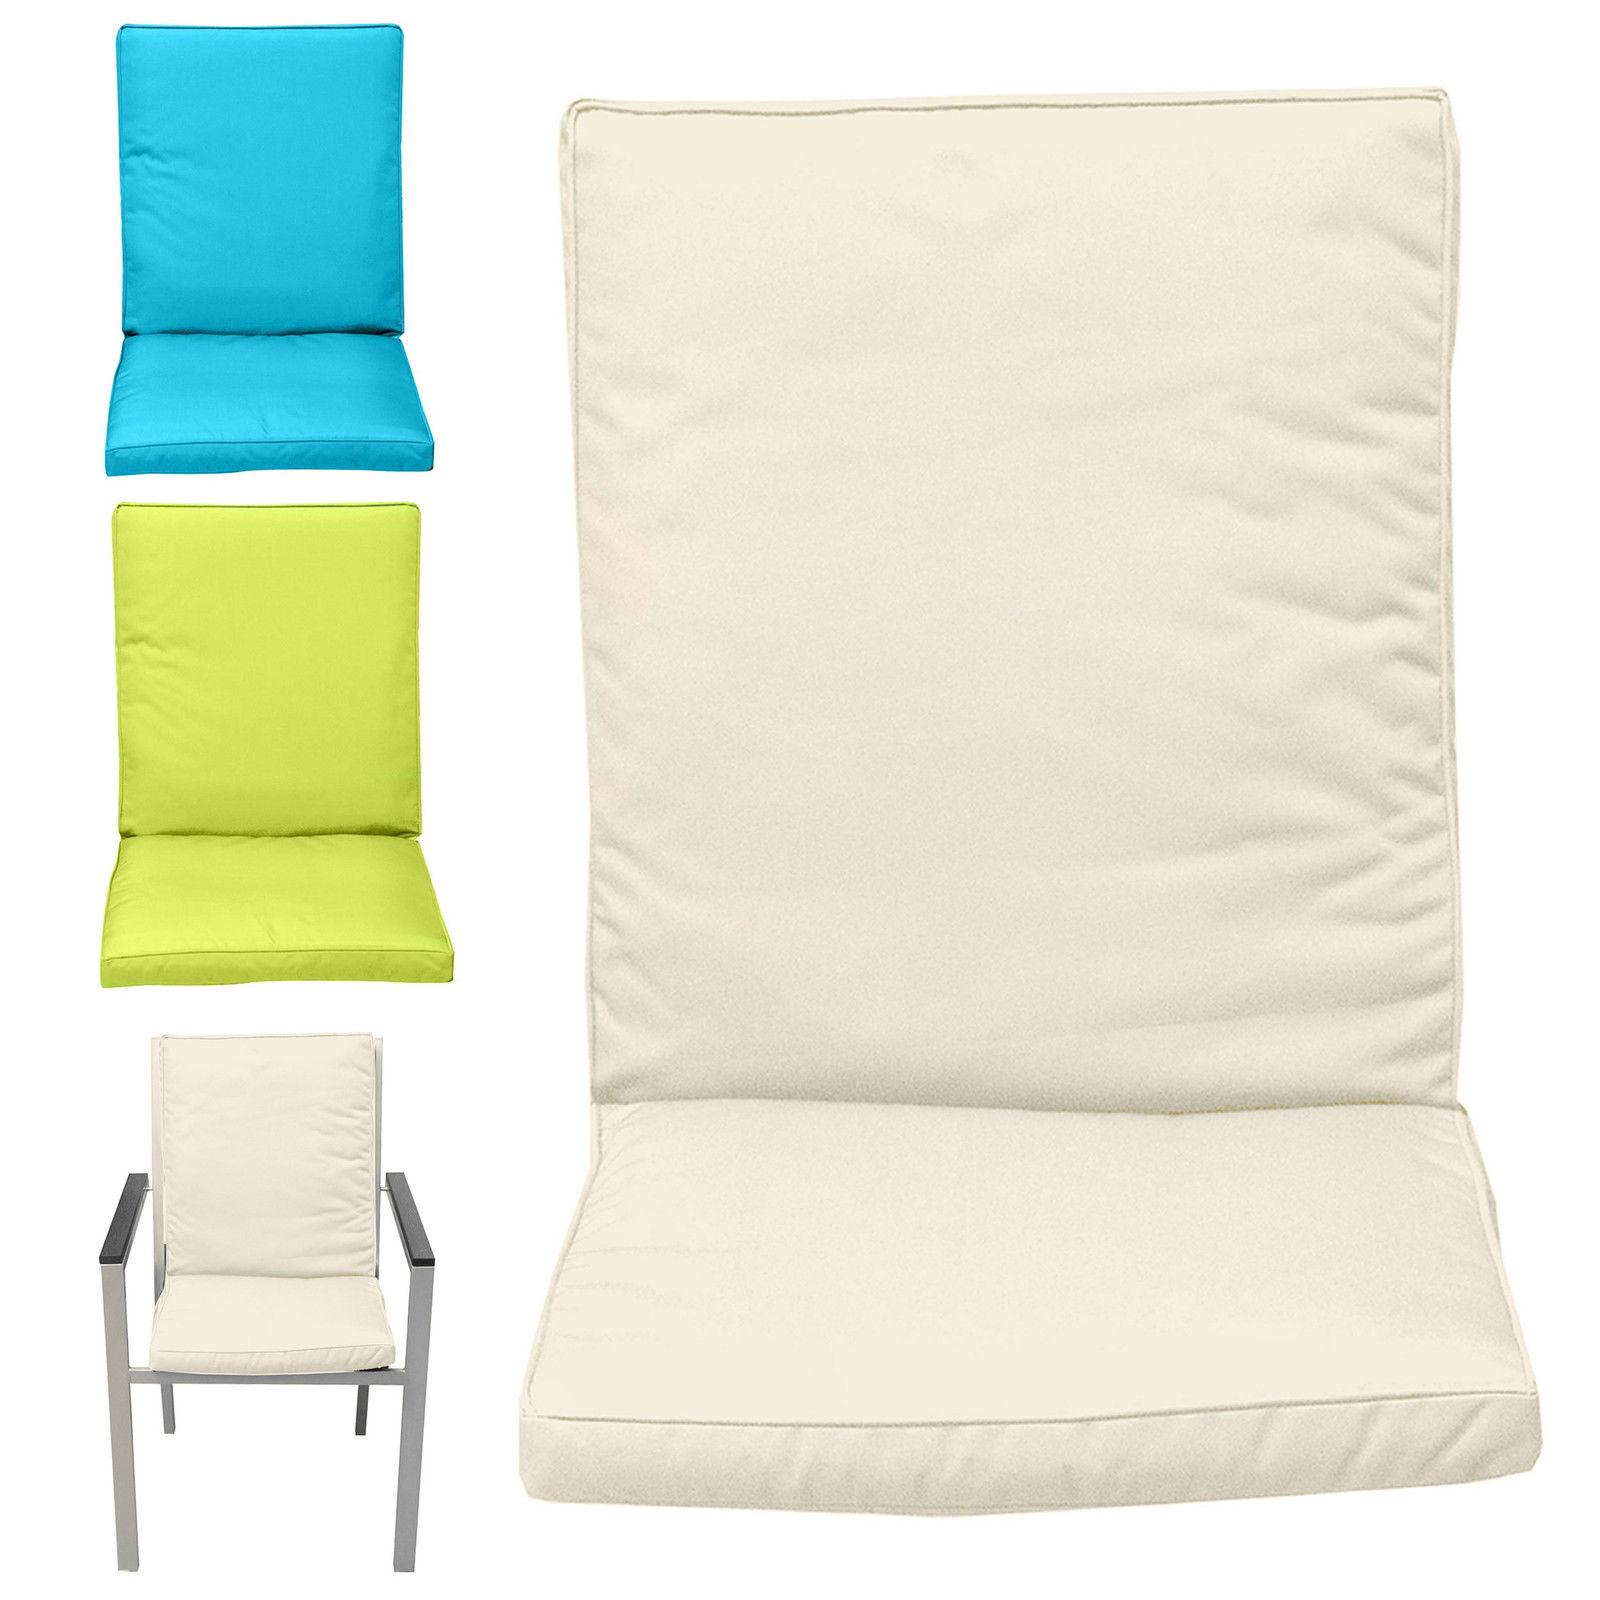 garden kitchen chair seat furniture waterproof foam cover. Black Bedroom Furniture Sets. Home Design Ideas